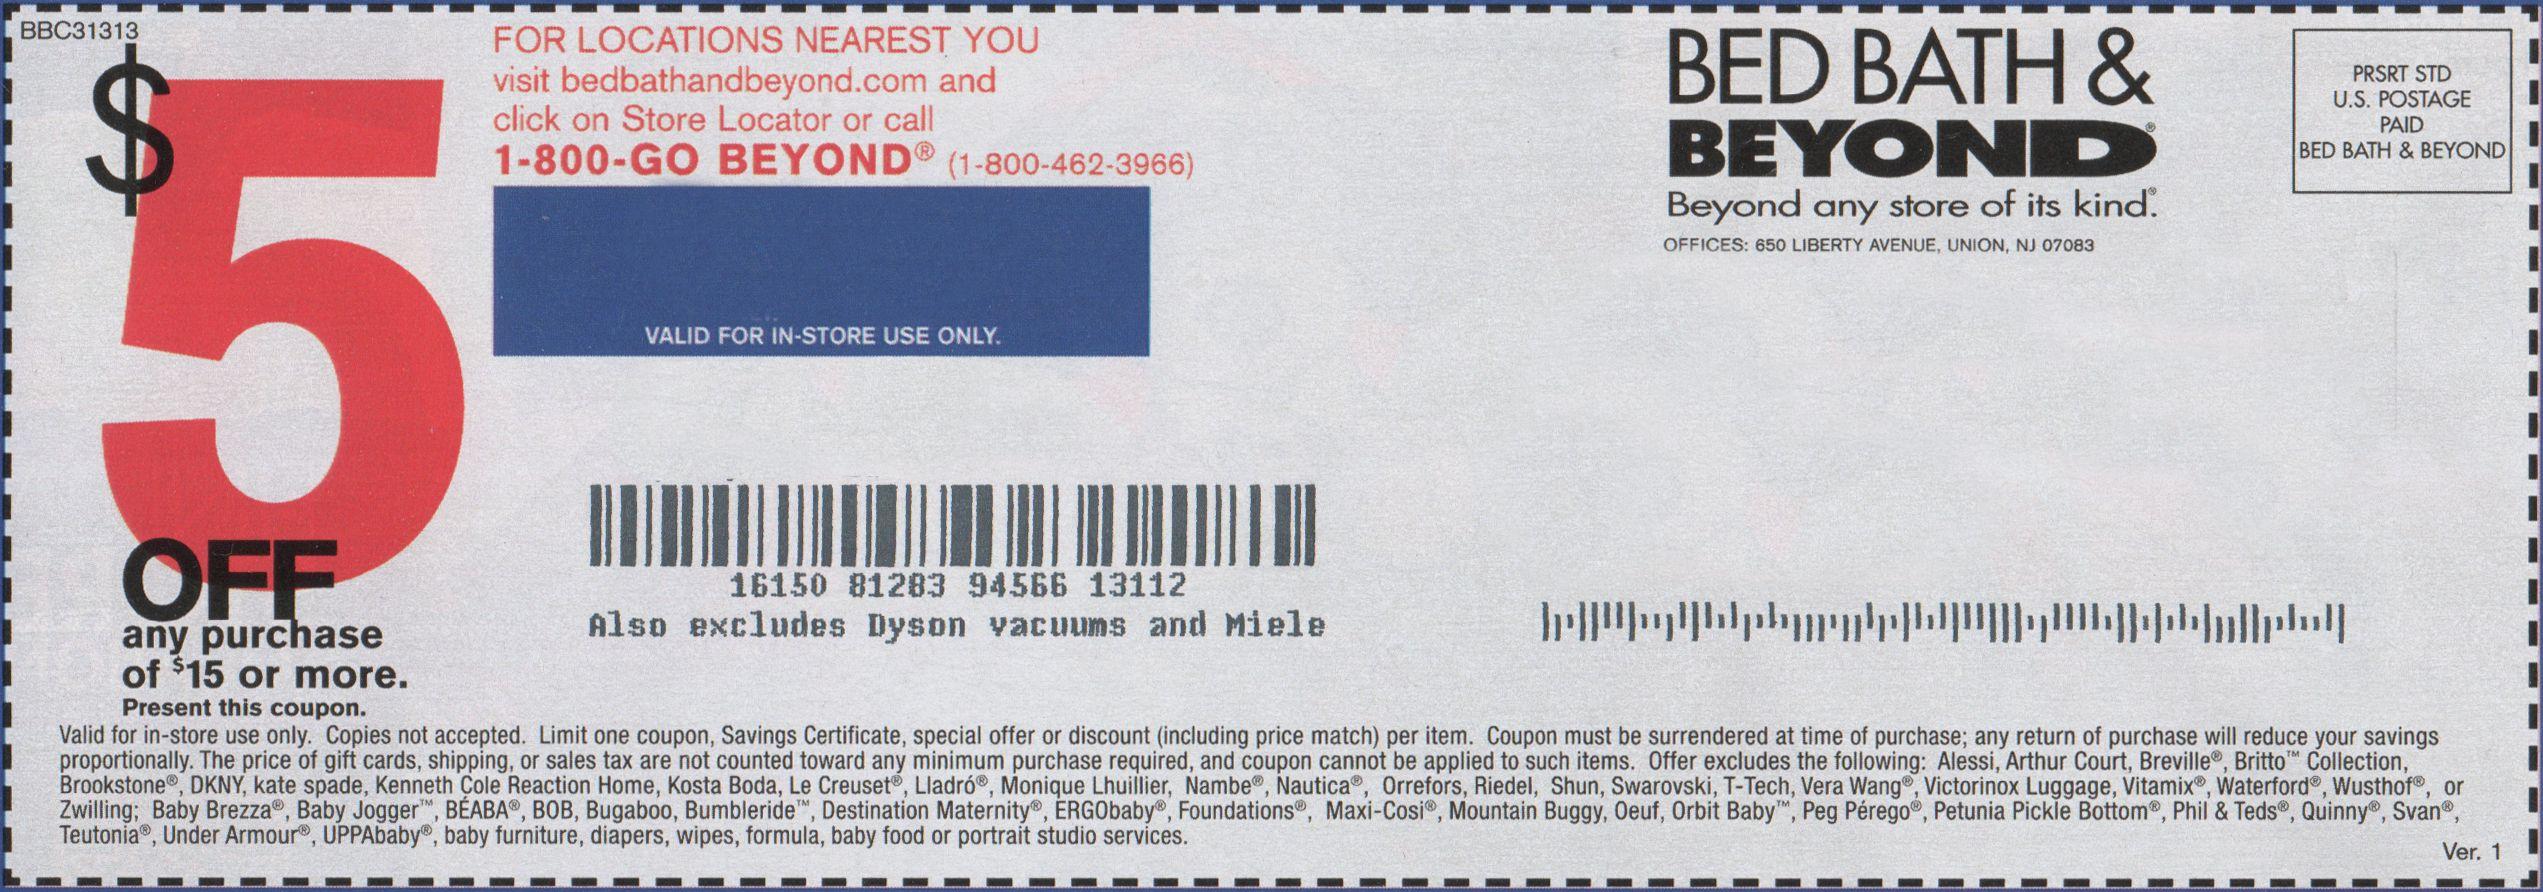 getting valid bed bath 20 coupon printable, bed bath & beyond inc